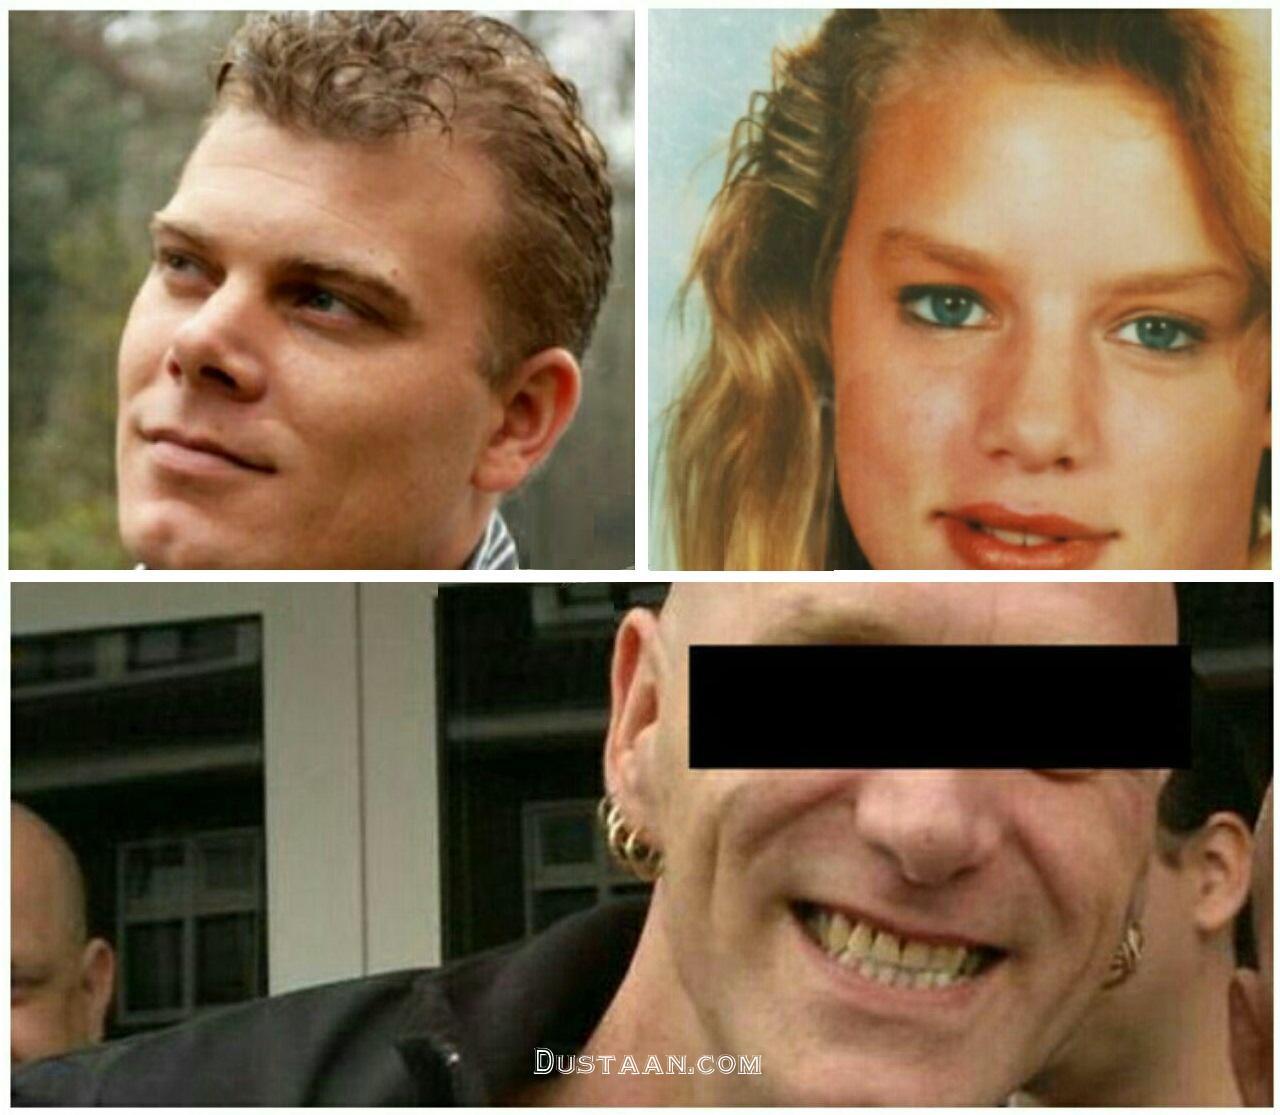 www.dustaan.com اقدام عجیب پسر جوان برای شناسایی قاتل خواهرش! +عکس